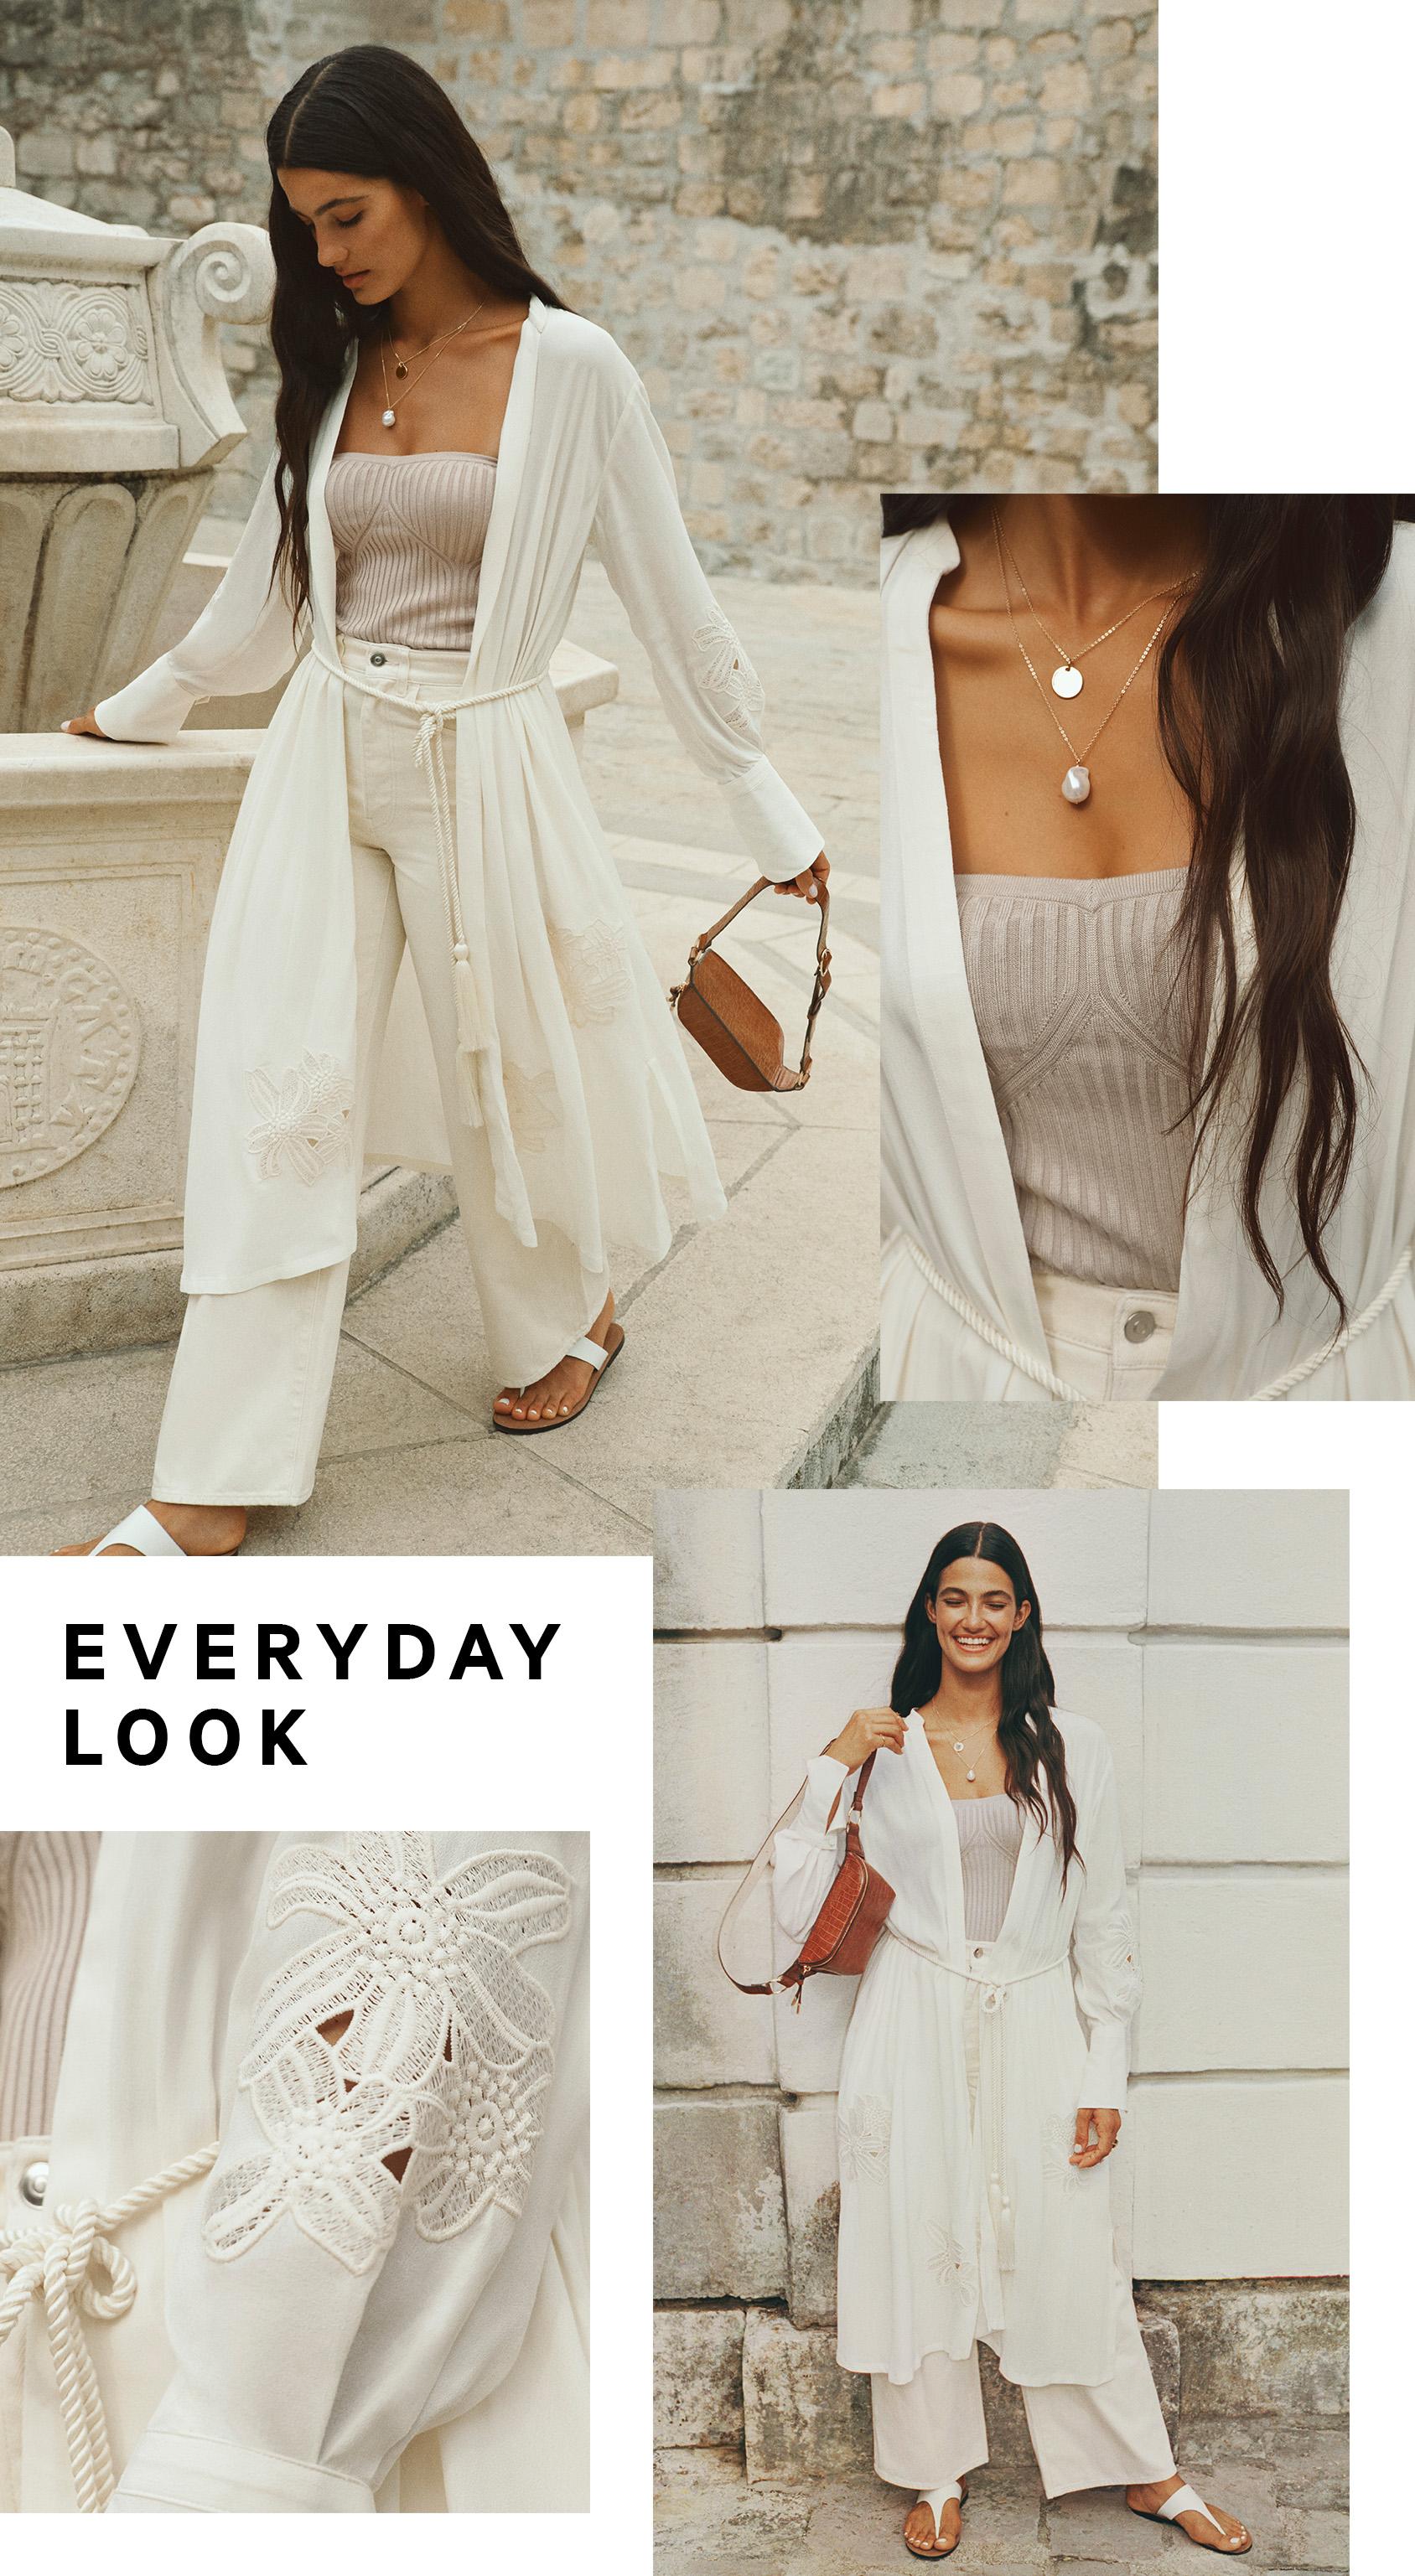 EVERYDAY LOOK H&M white dress